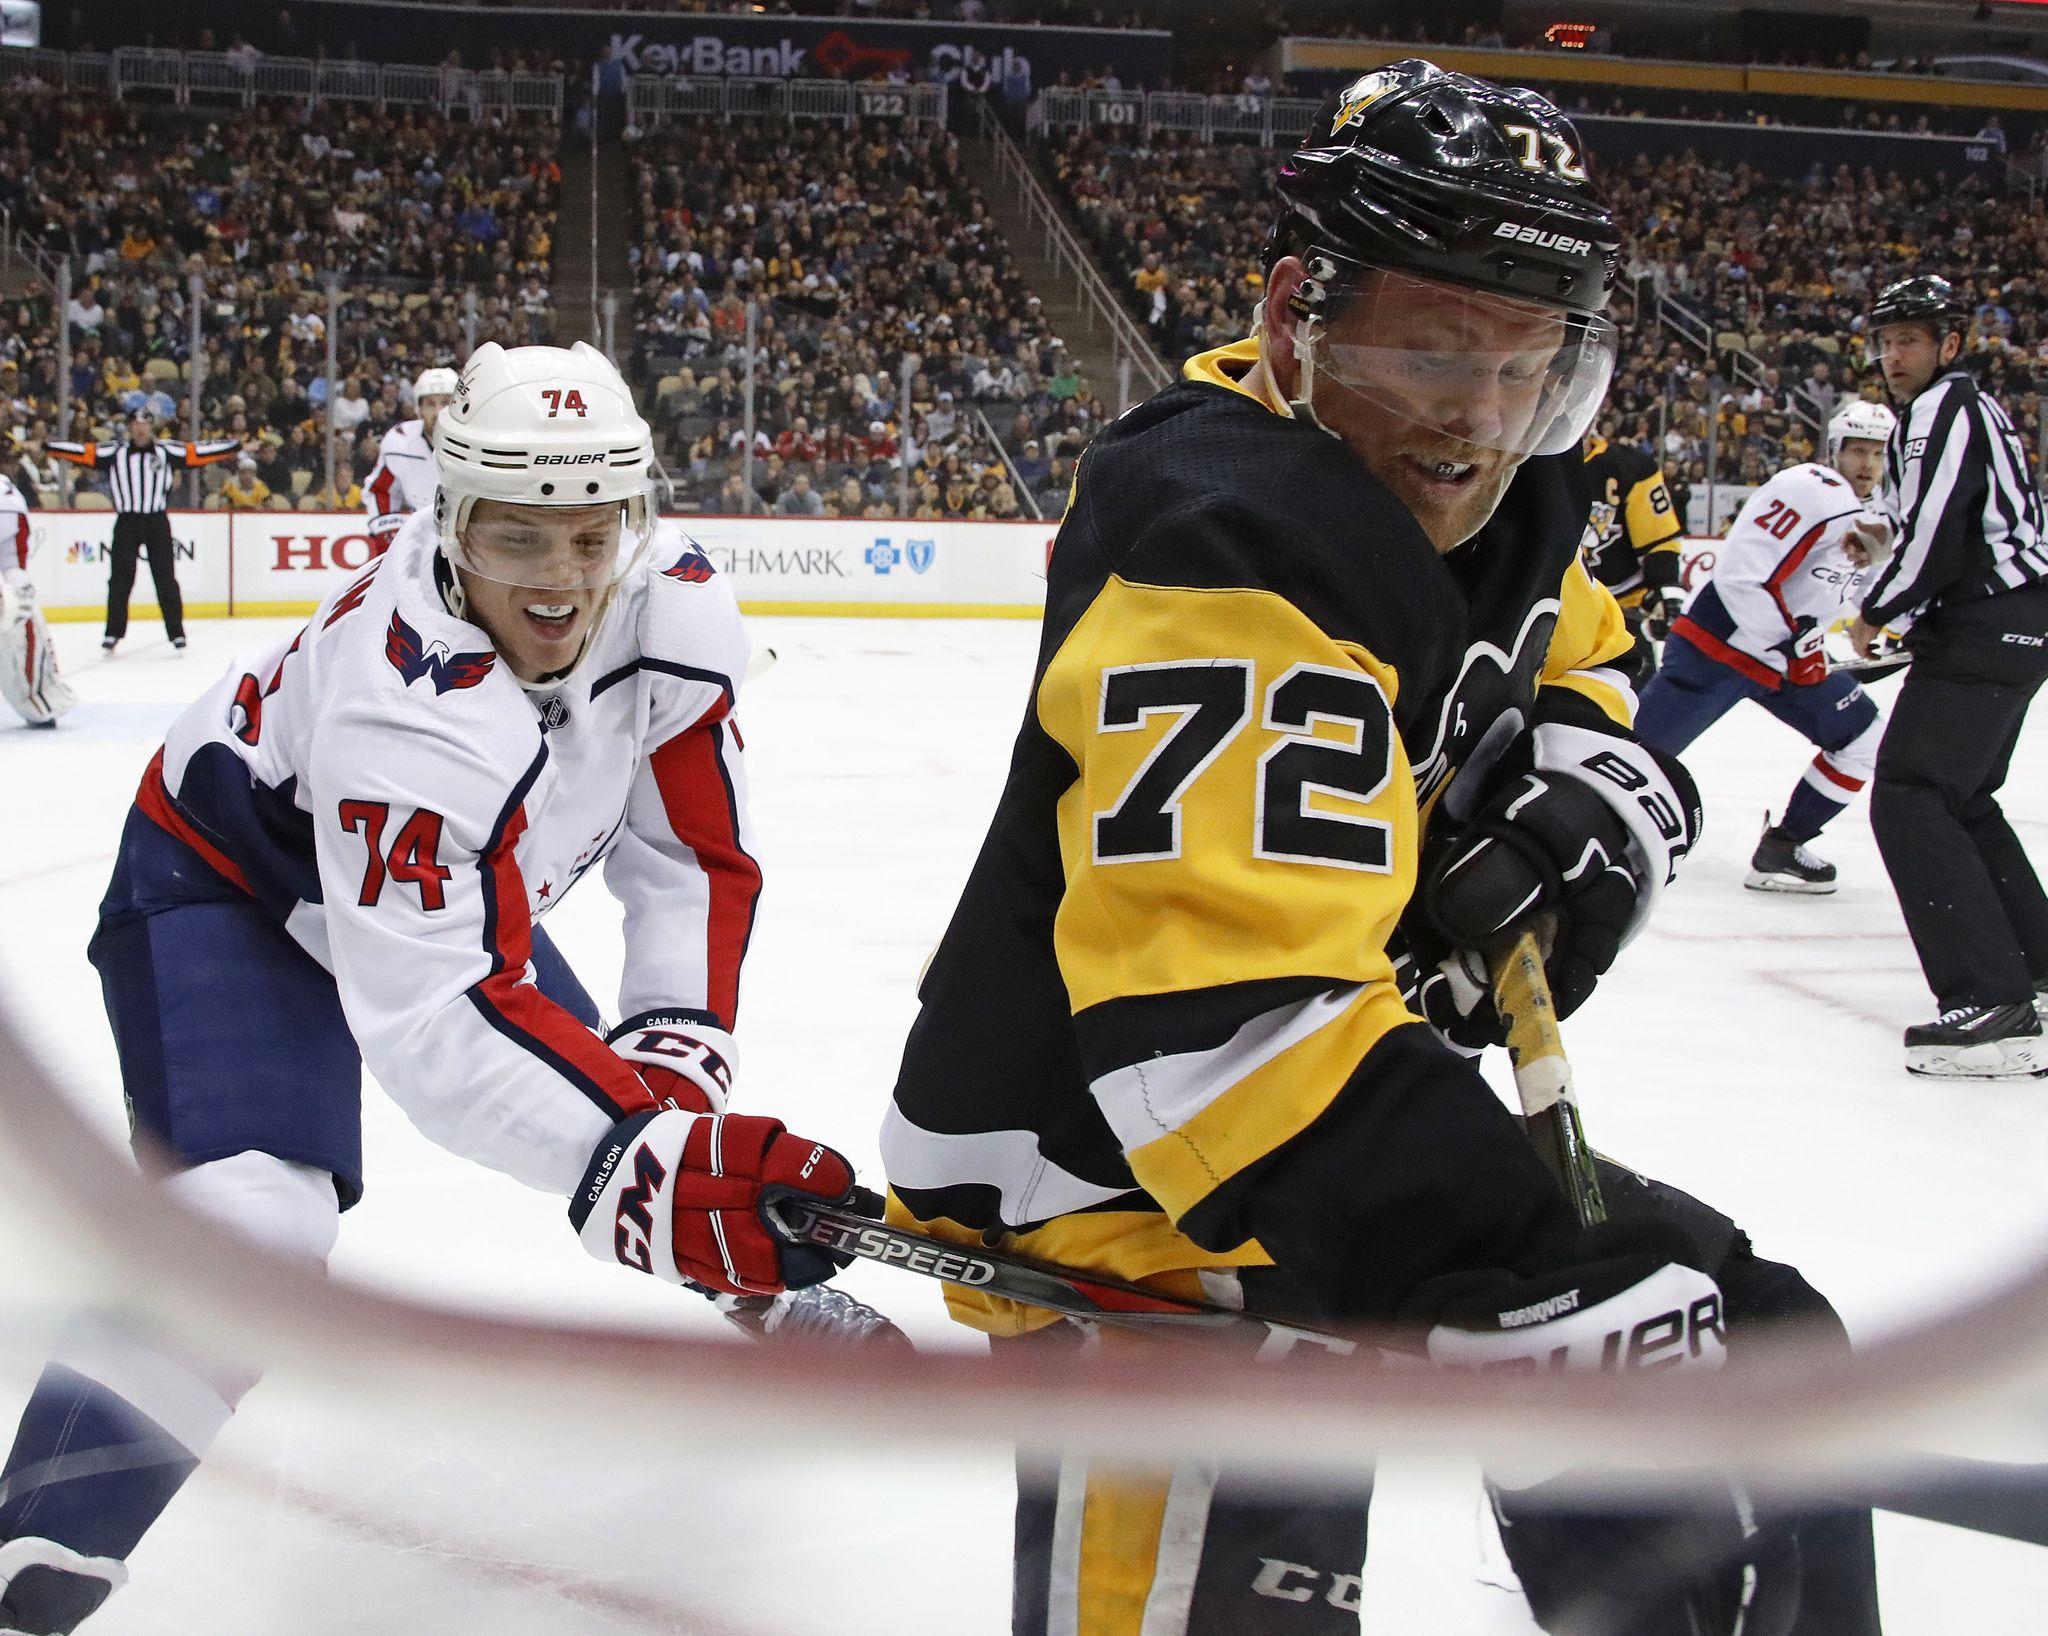 Capitals_penguins_hockey_45000.jpg-59d91_s2048x1636